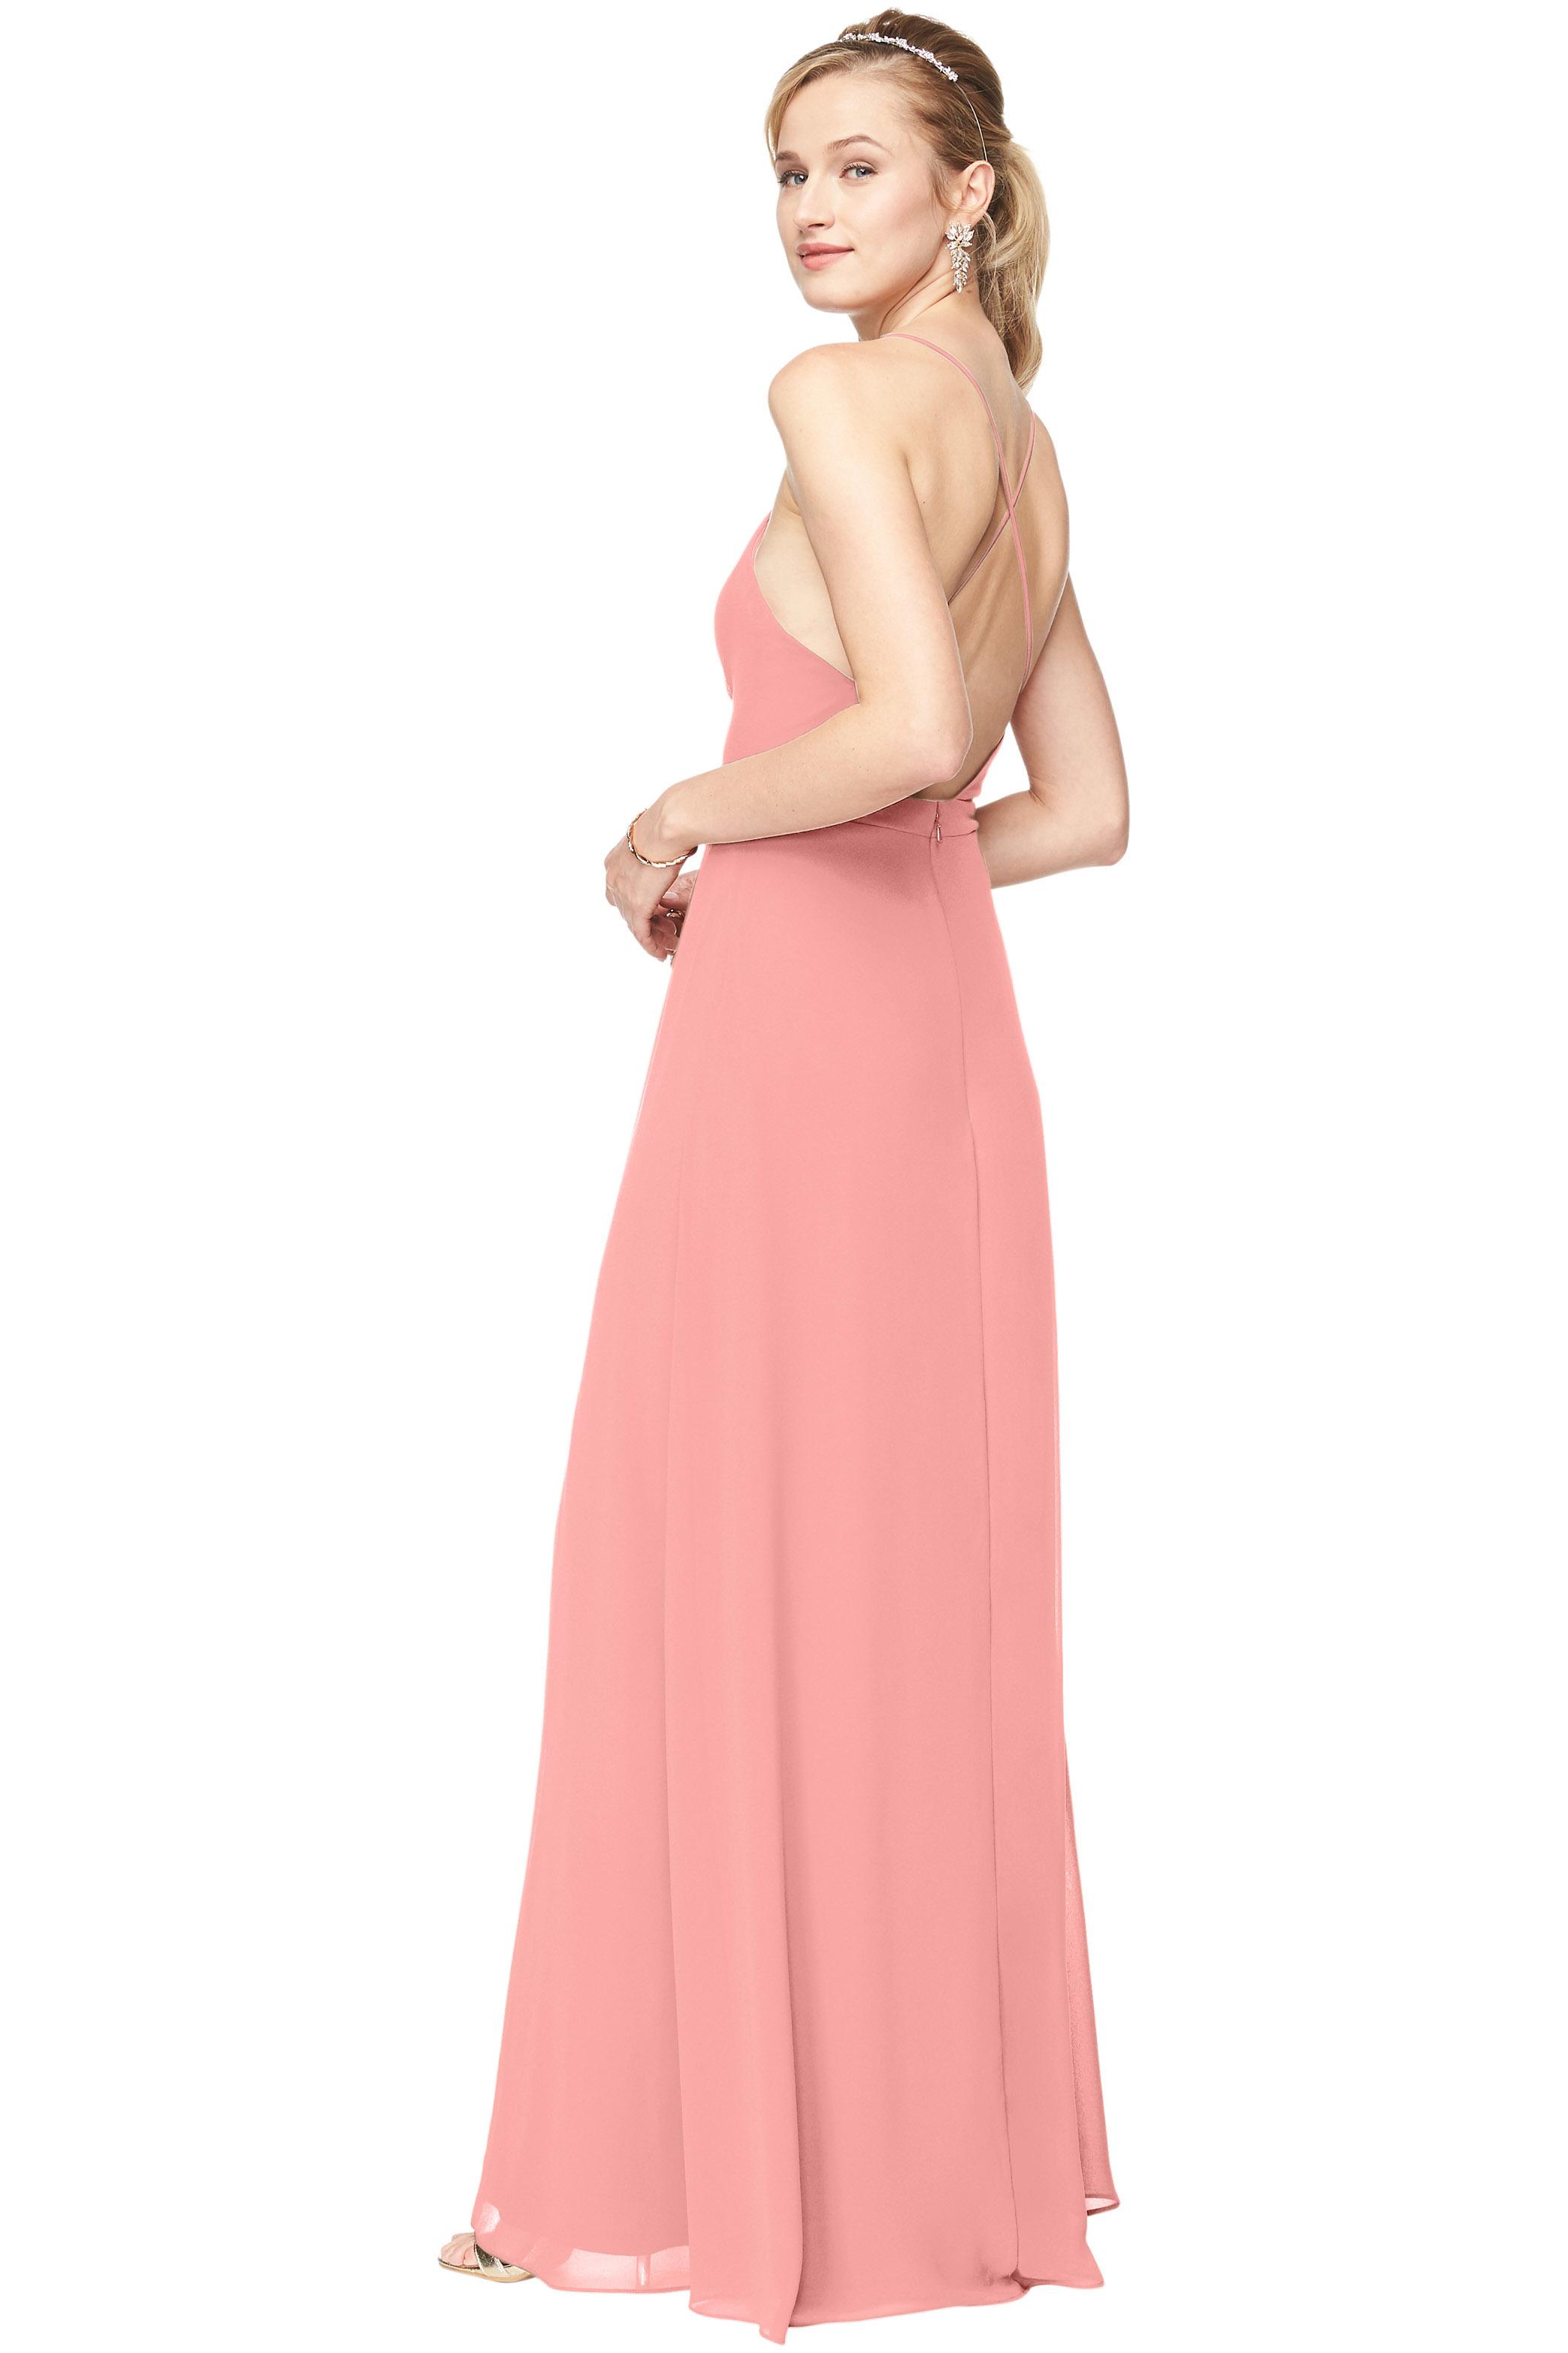 Bill Levkoff CORAL Chiffon Surplice A-Line gown, $178.00 Back